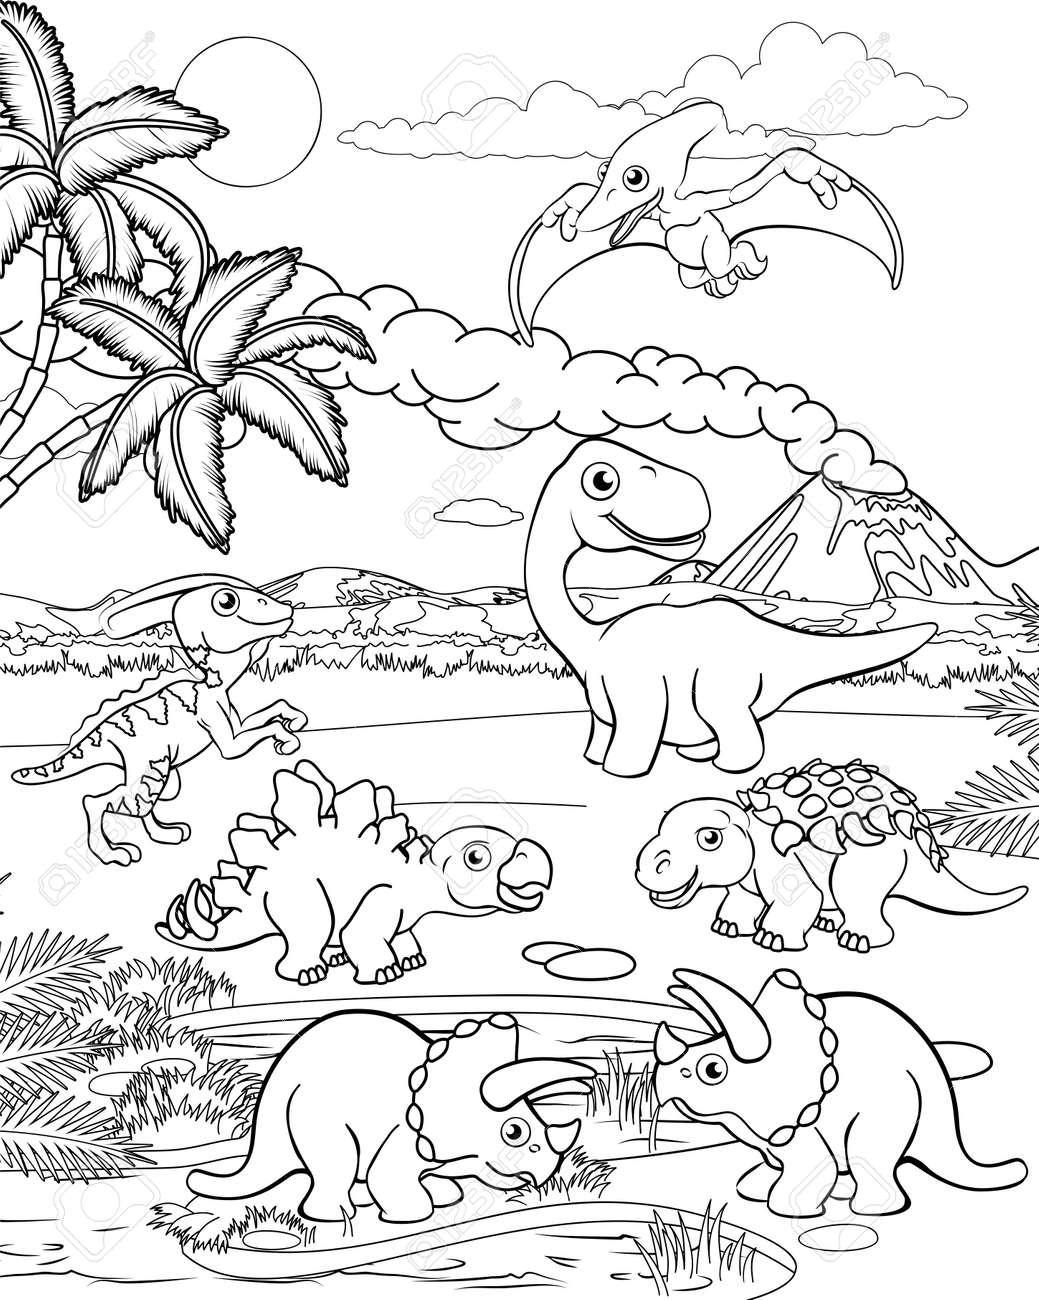 A dinosaur cartoon cute animal background prehistoric landscape coloring outline scene. - 121753374